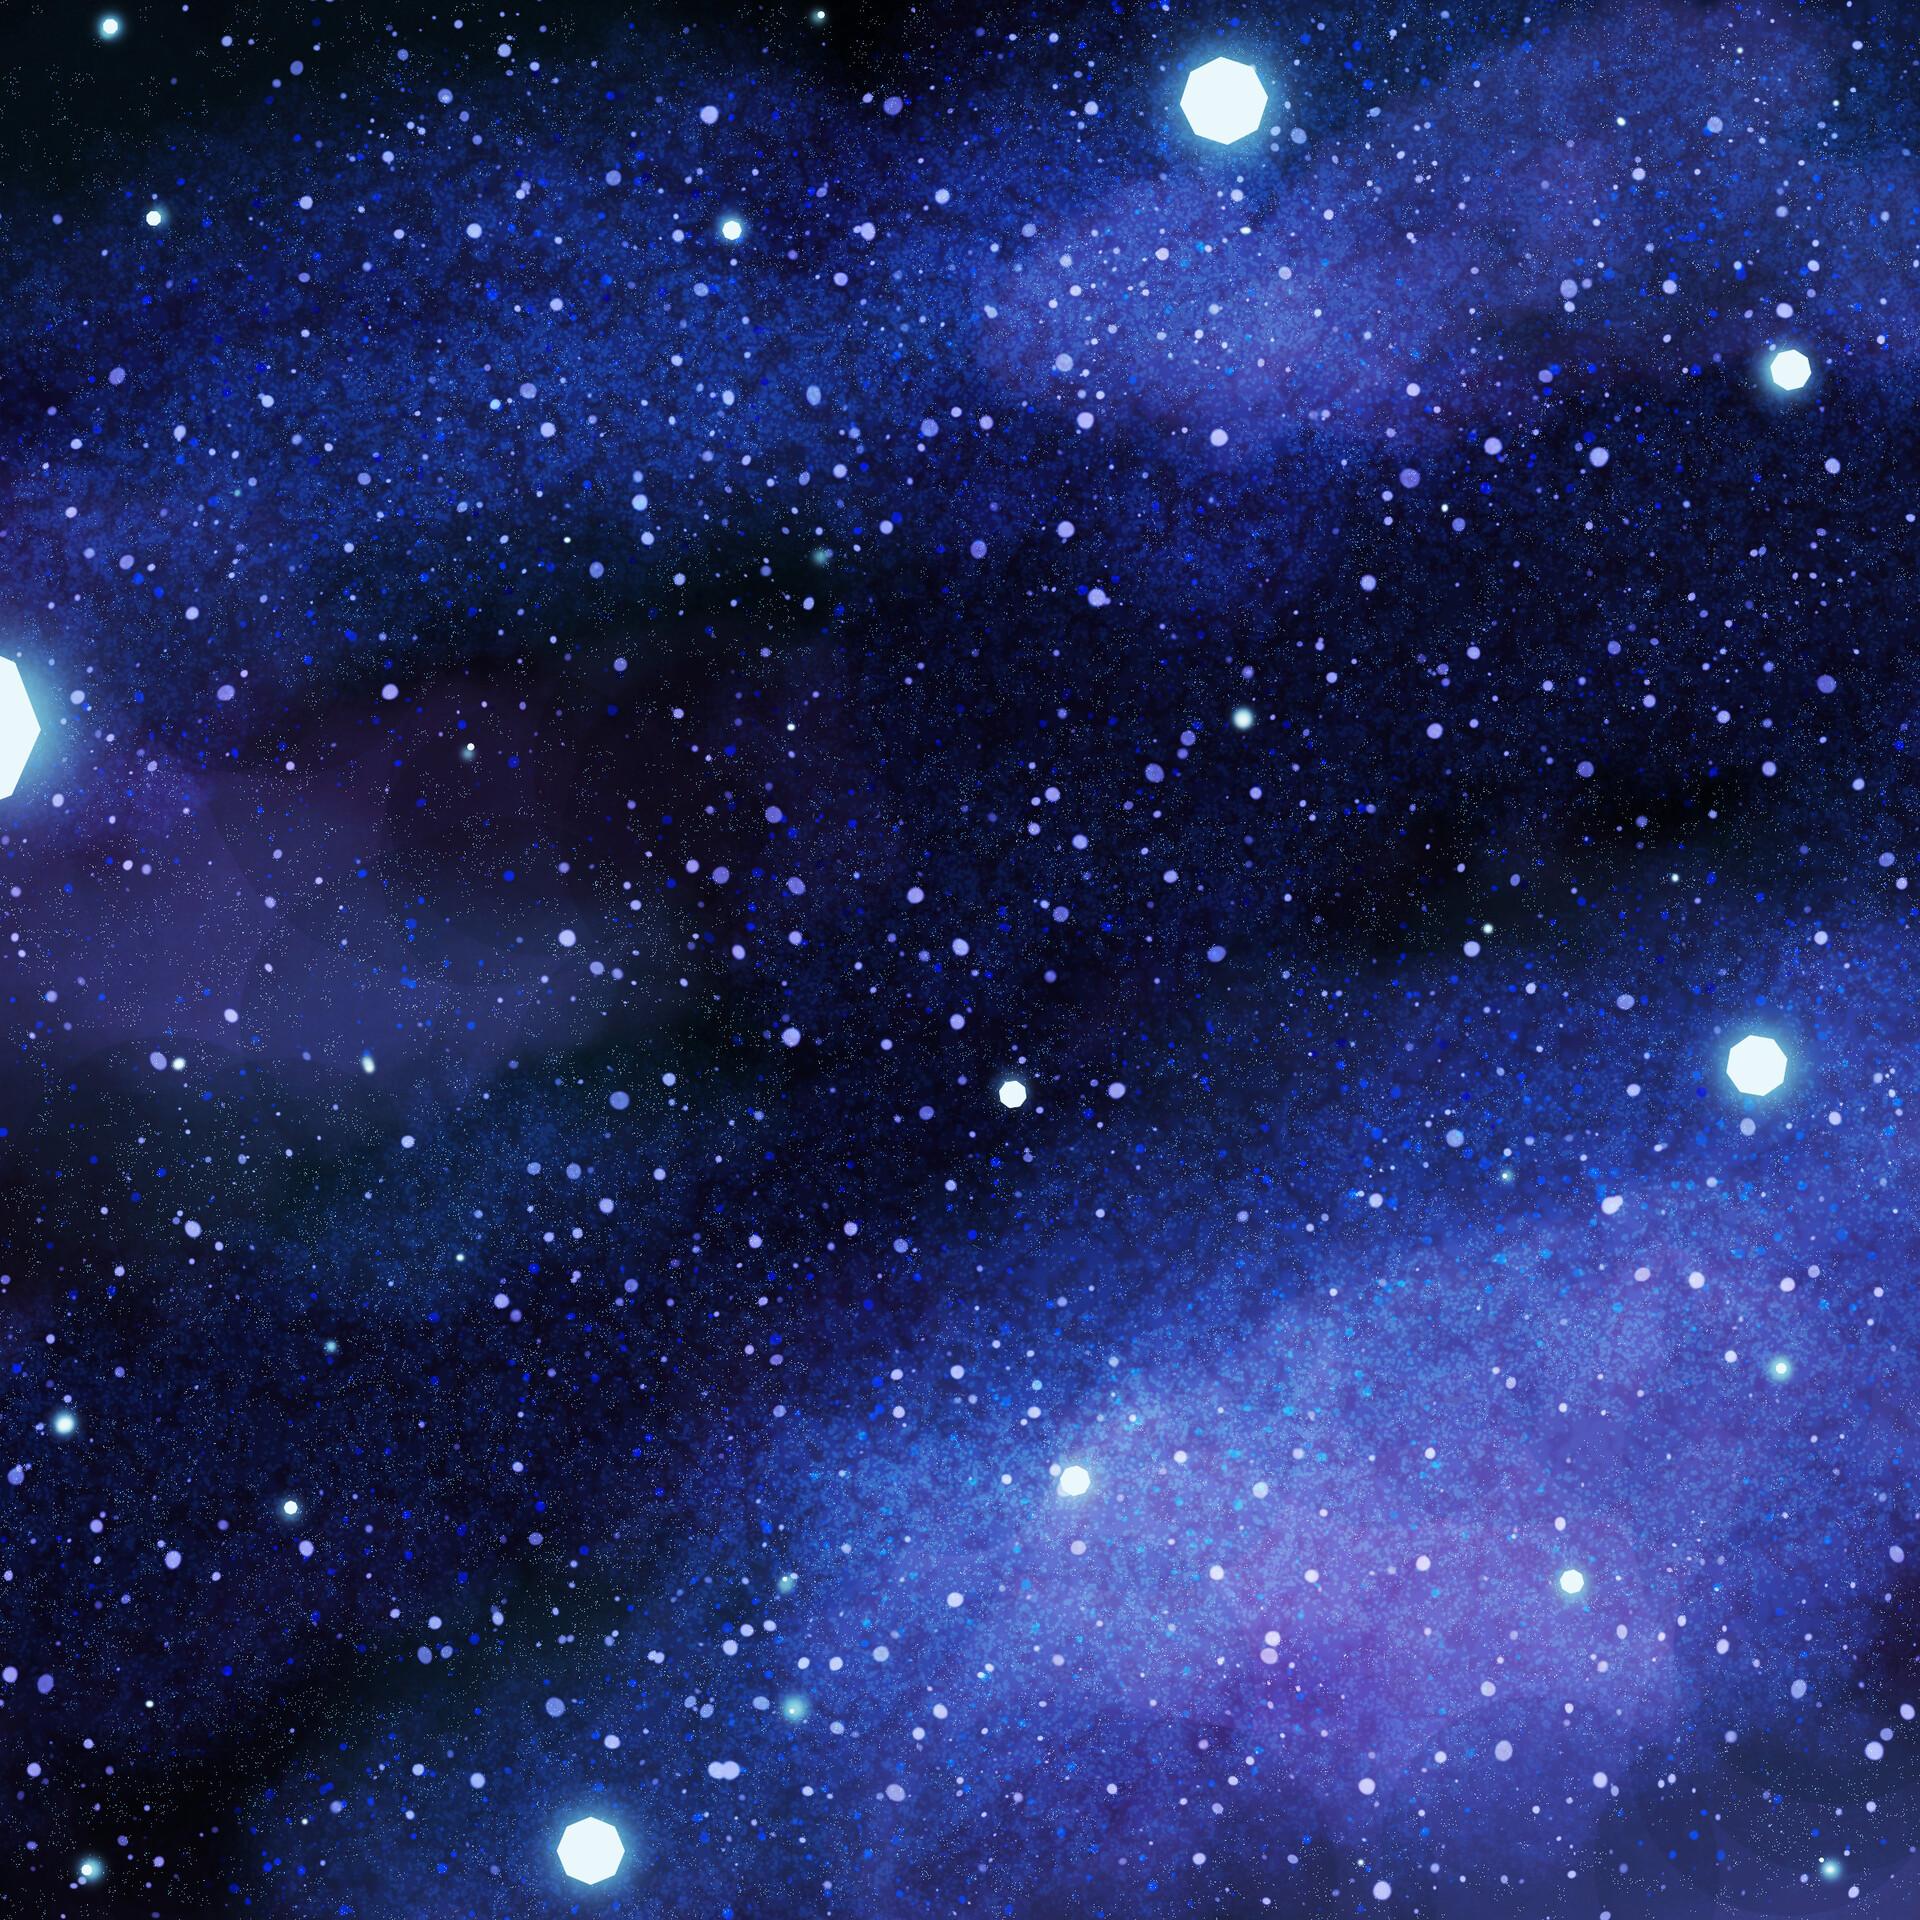 Brienne broyles pl star study 22